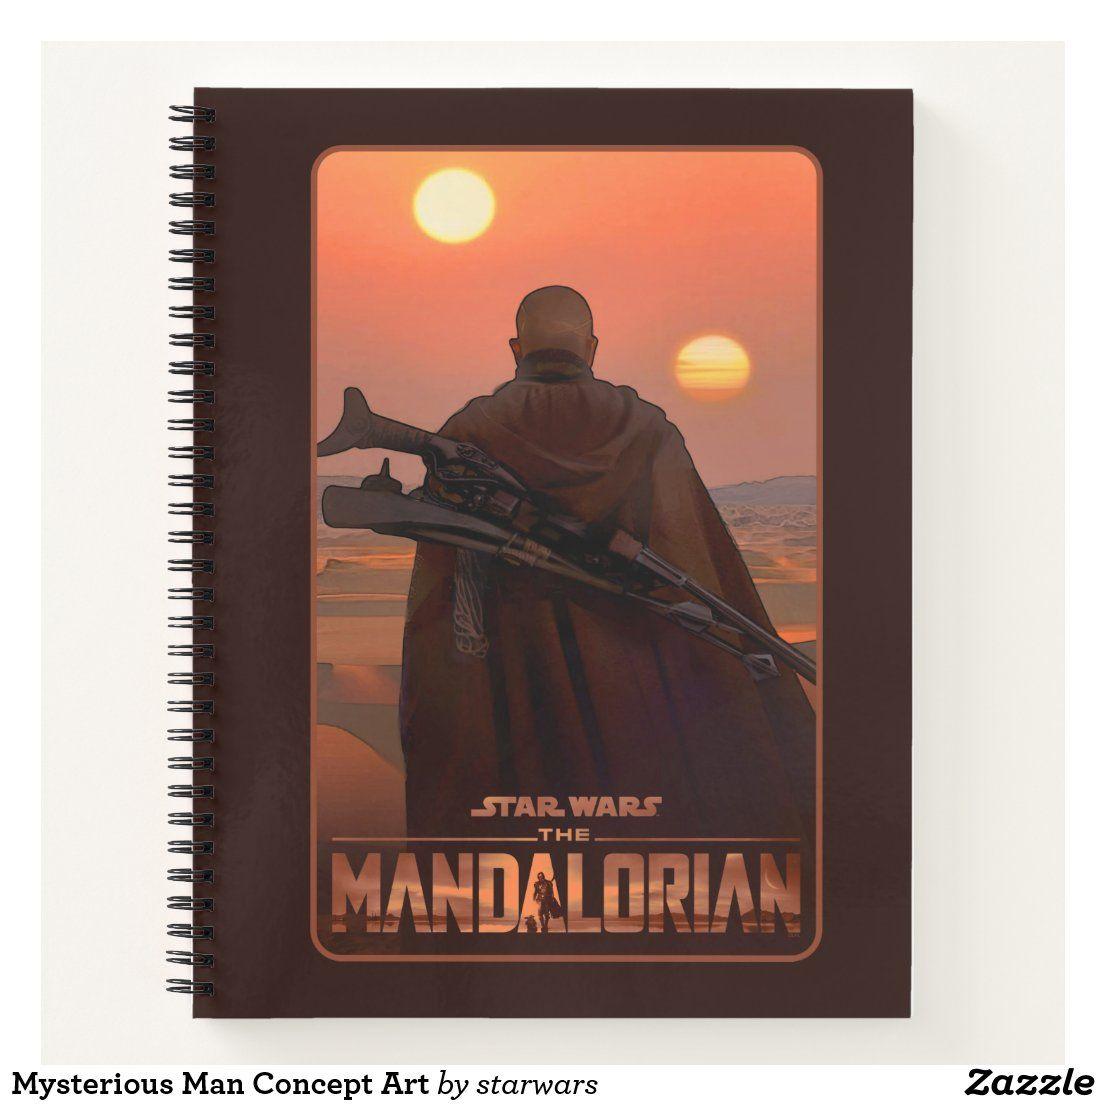 Mysterious Man Concept Art Notebook Zazzle Com In 2021 Star Wars Gifts Concept Art Star Wars Merch